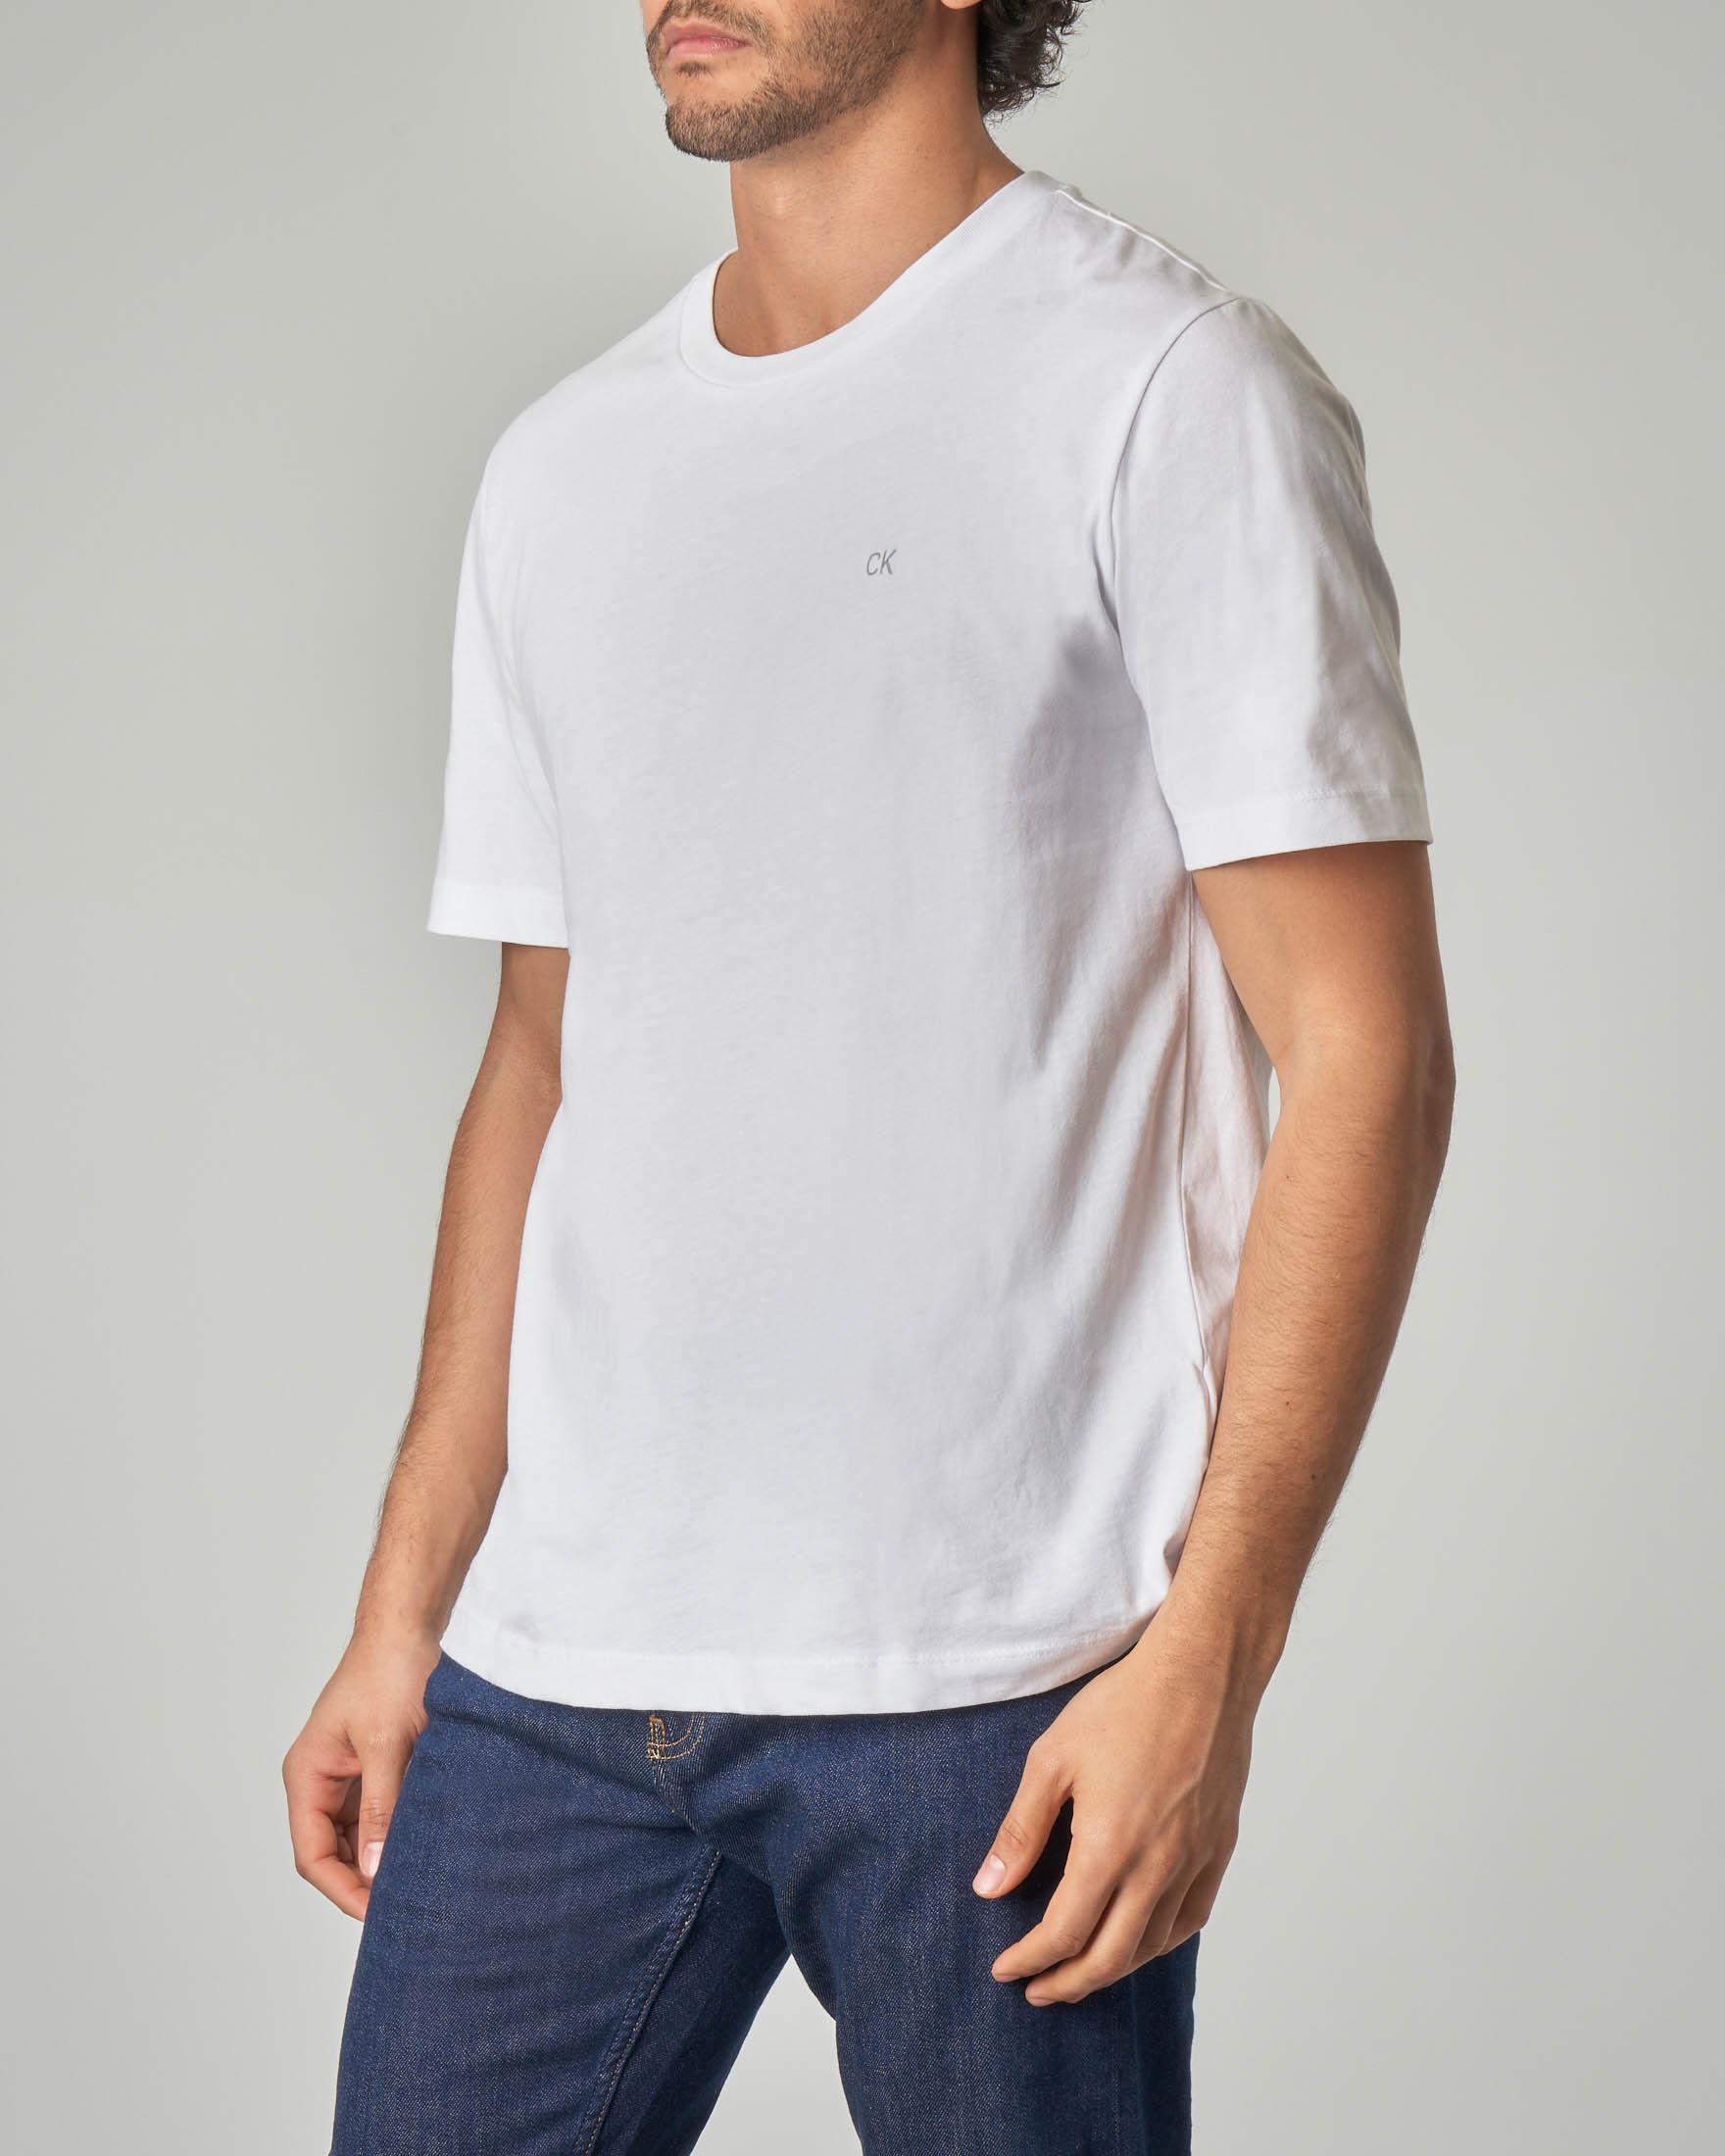 T-shirt bianca con logo CK